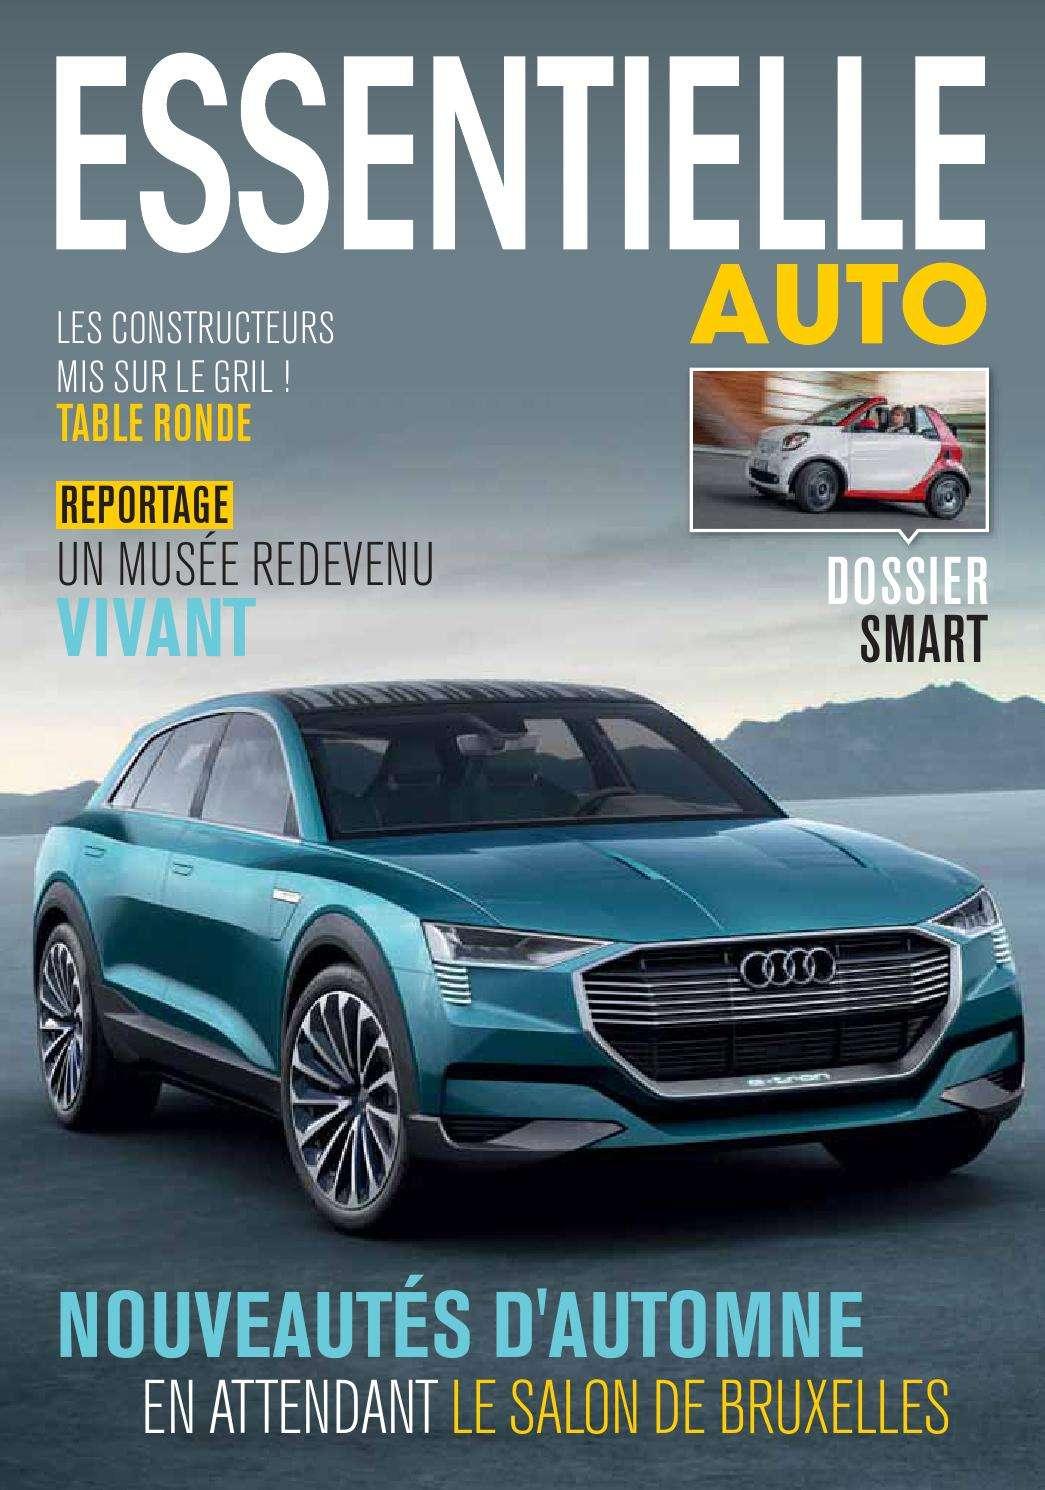 Essentielle Auto – octobre 2015